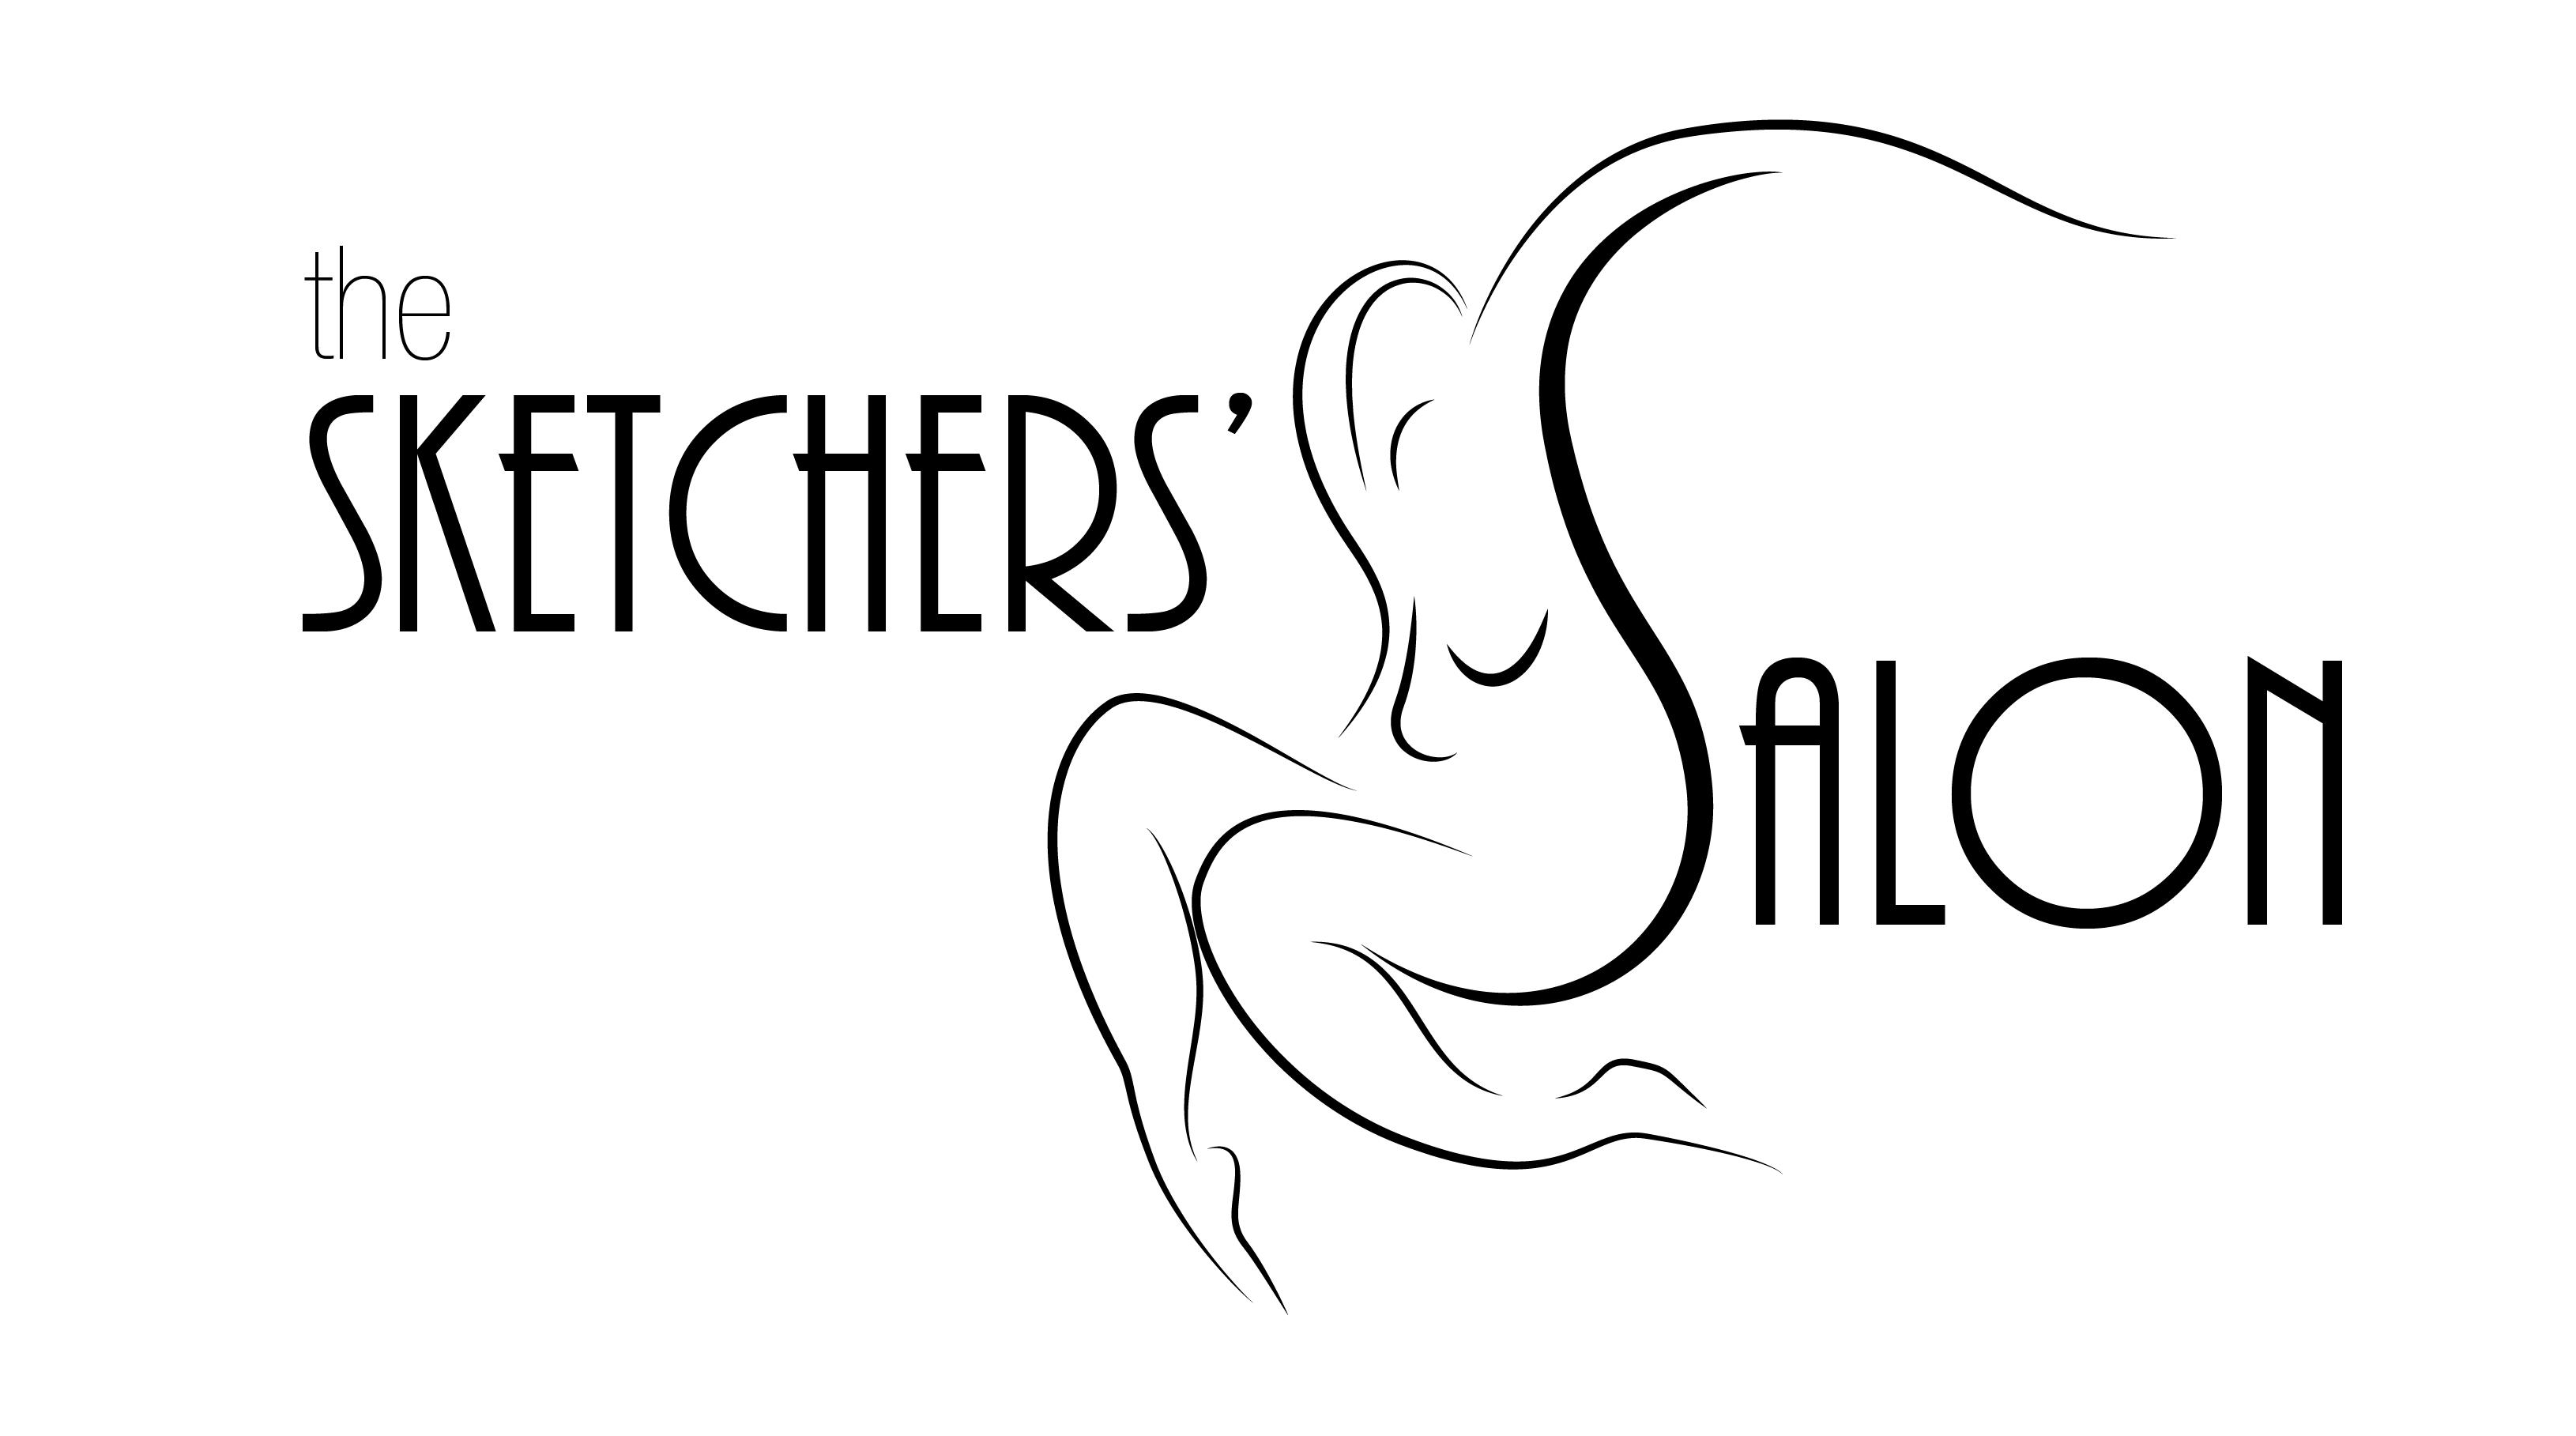 The Sketchers Salon